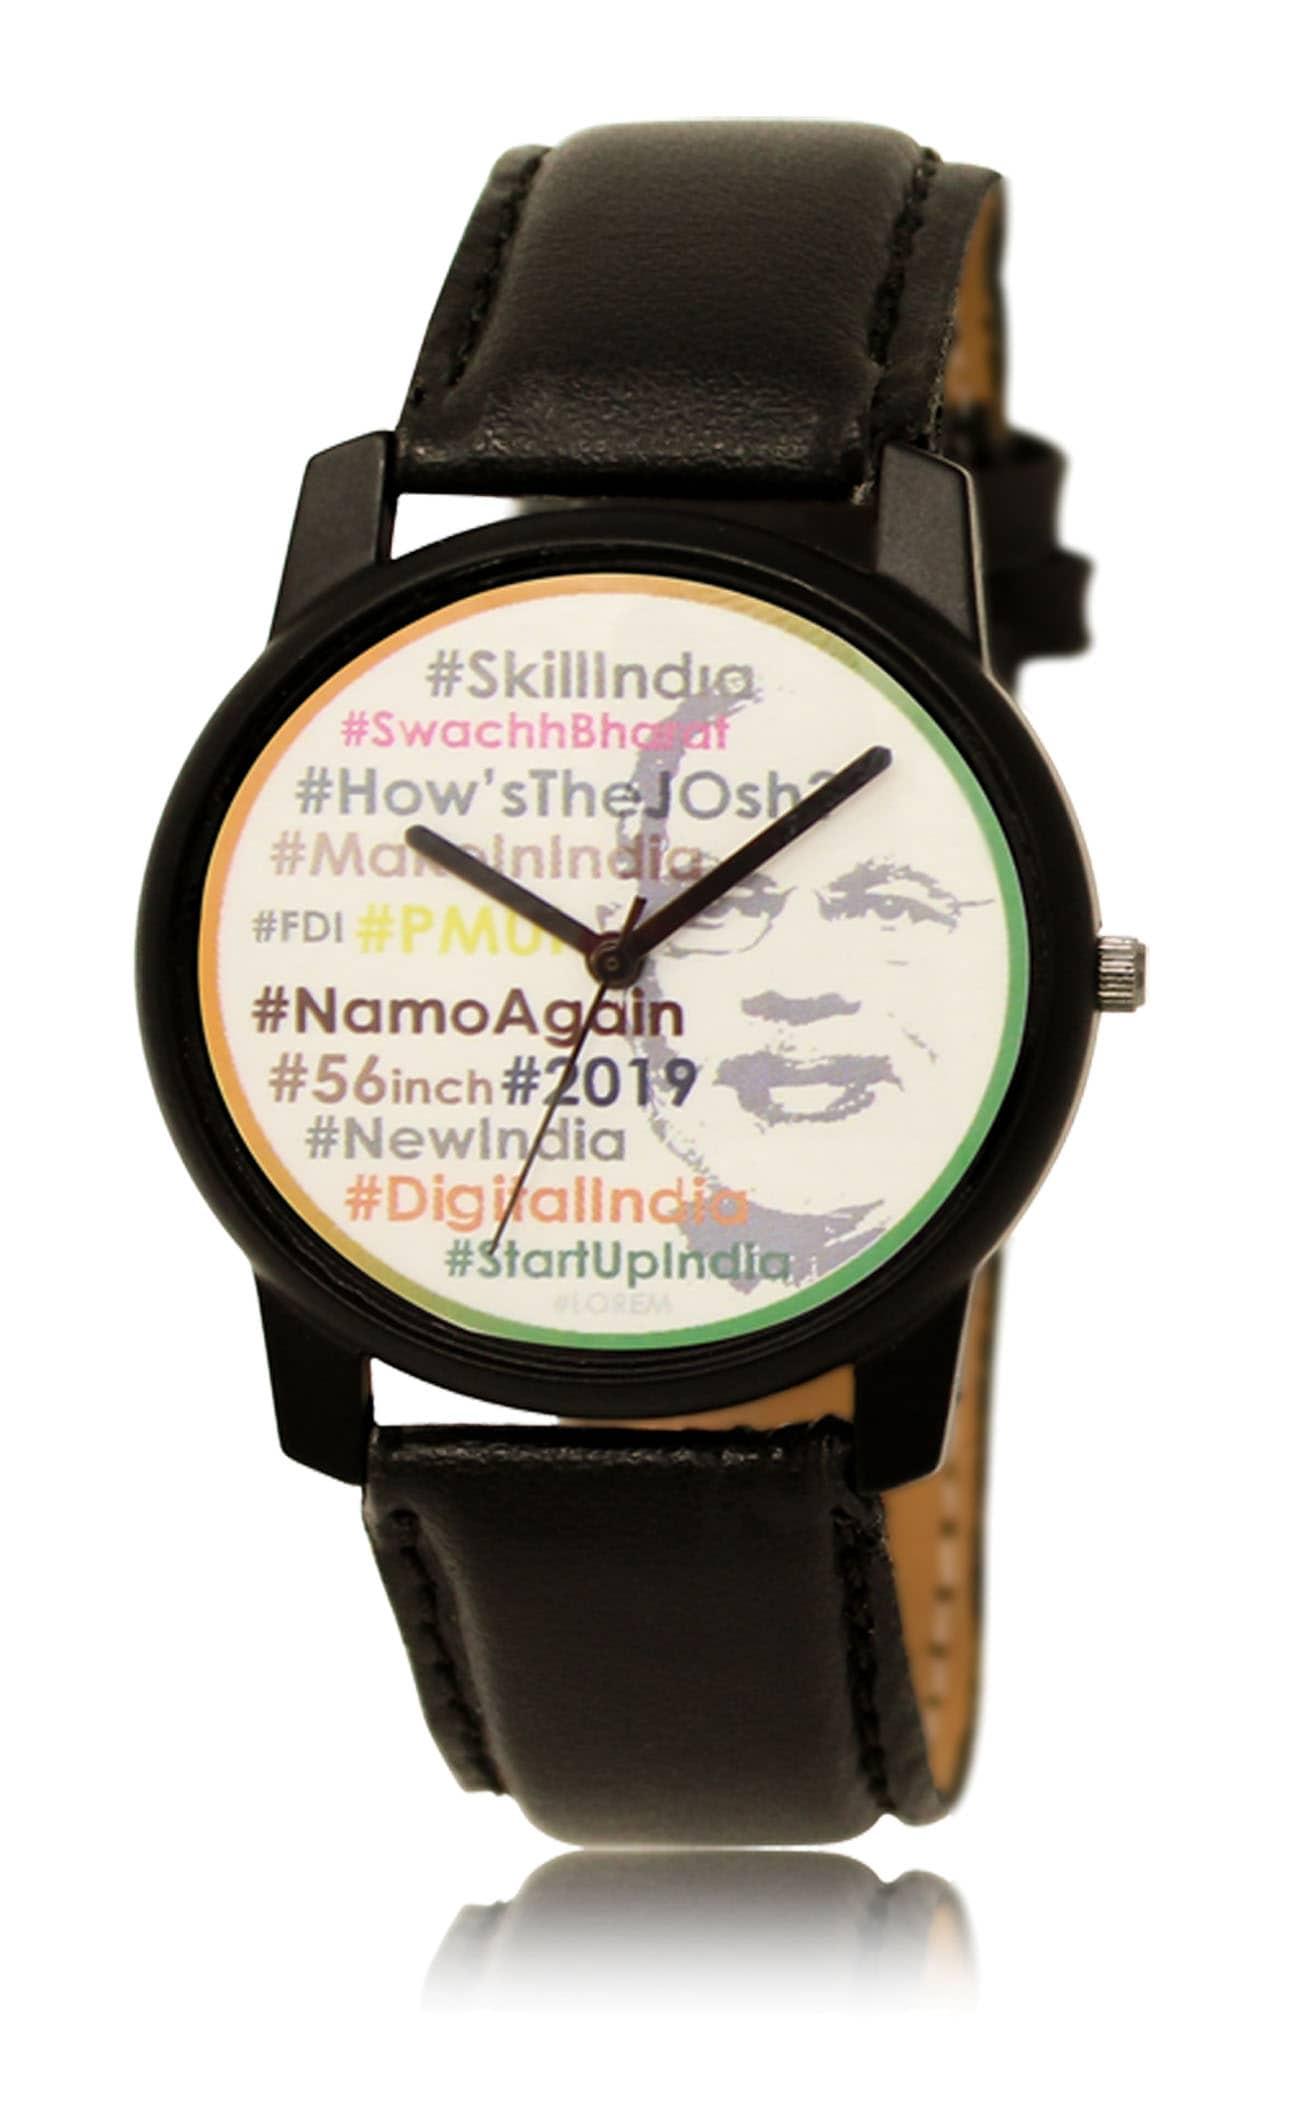 NAMO Again 2019 MODI Election Watch #ModiFever #VoteForMODI #FirEkBarModiSarkar Analog Watch - For Men